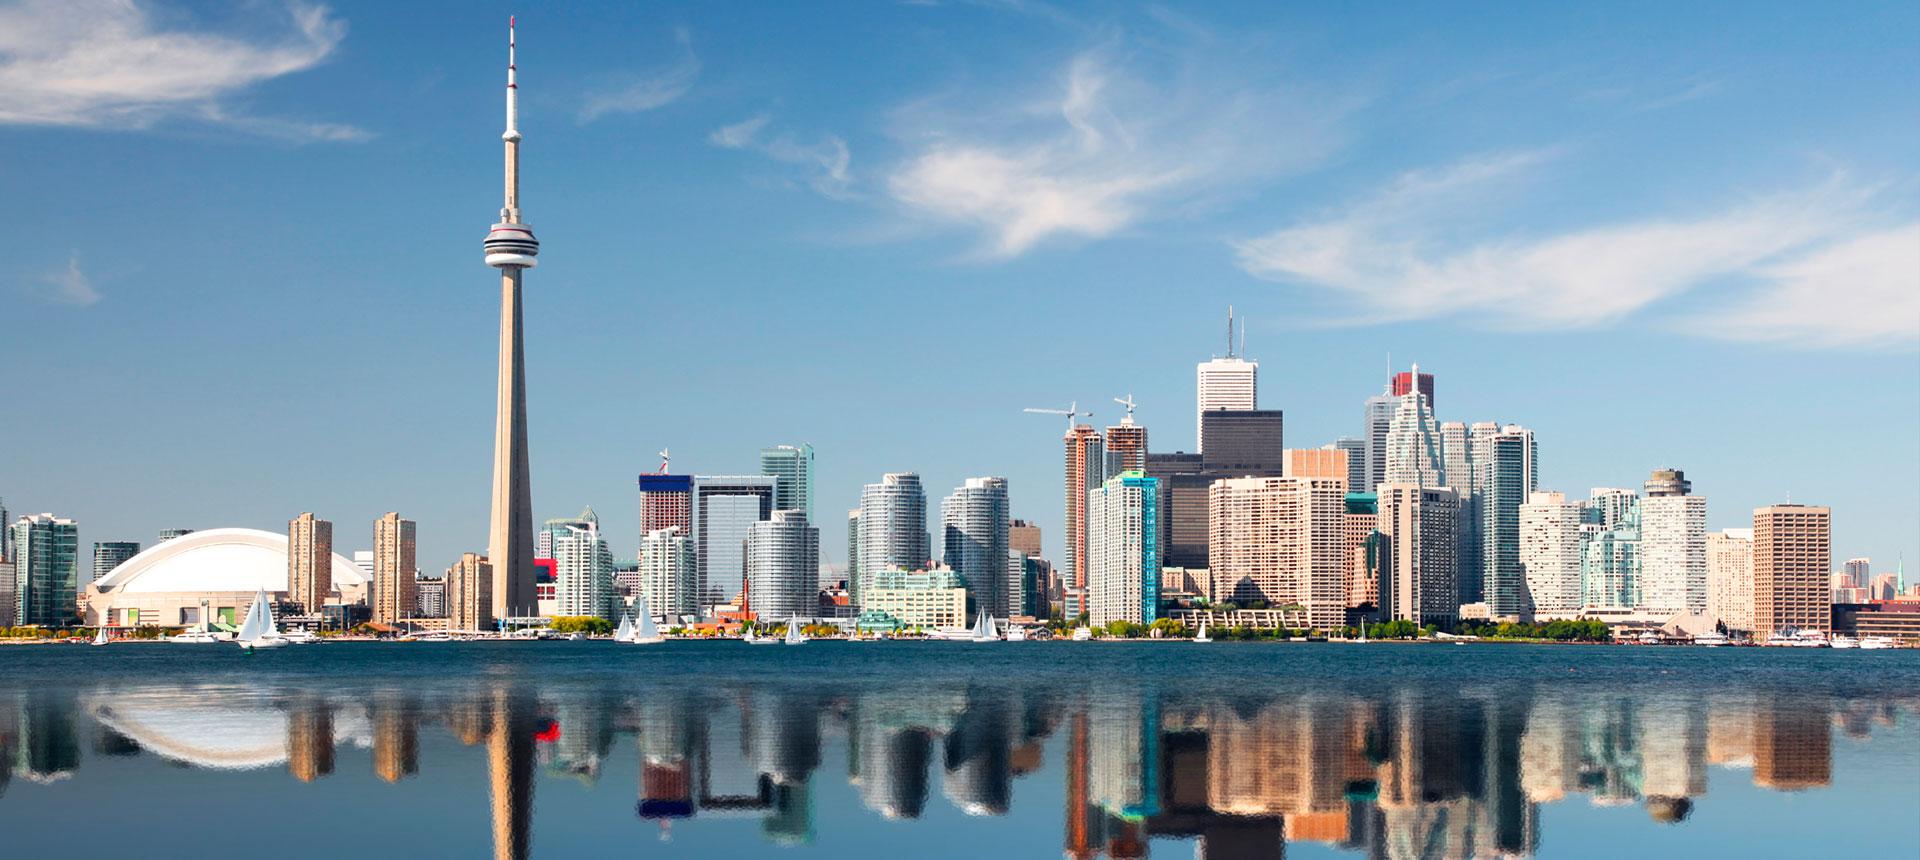 toronto-kanada-lise-egitimi-kanada-royal-elite-8.jpg